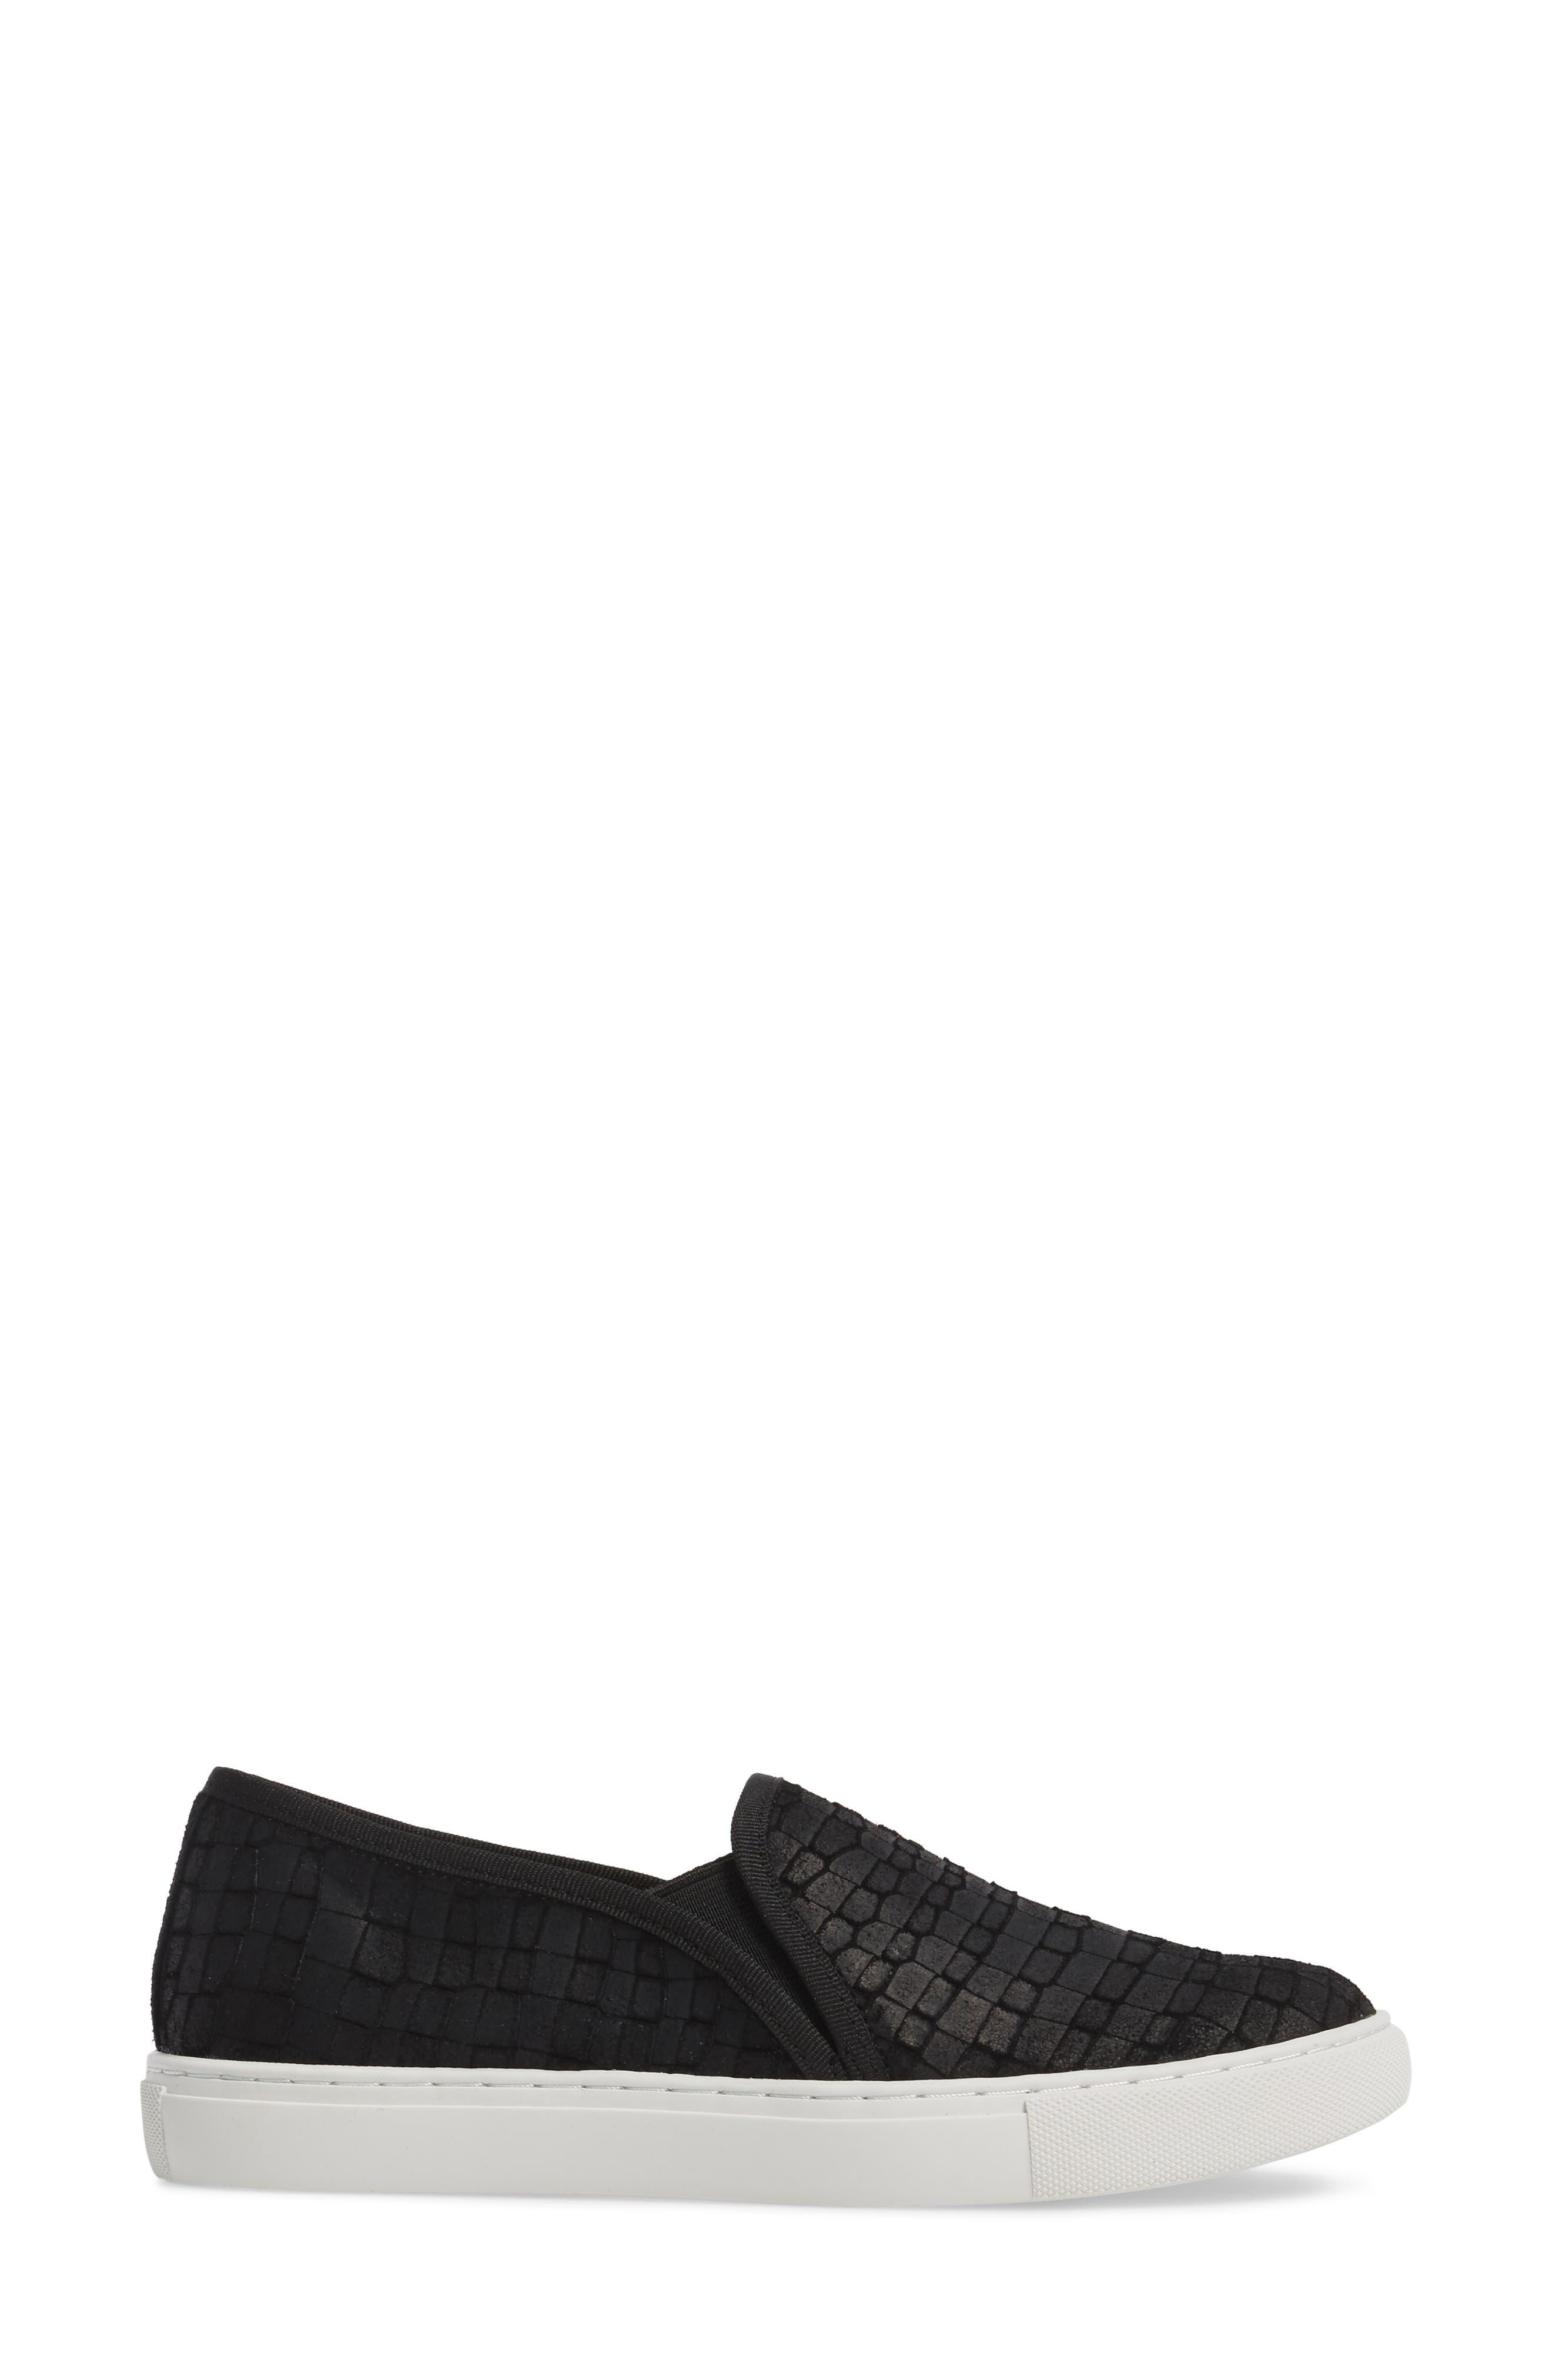 CC Corso Como Skipper Slip-On Sneaker,                             Alternate thumbnail 3, color,                             002